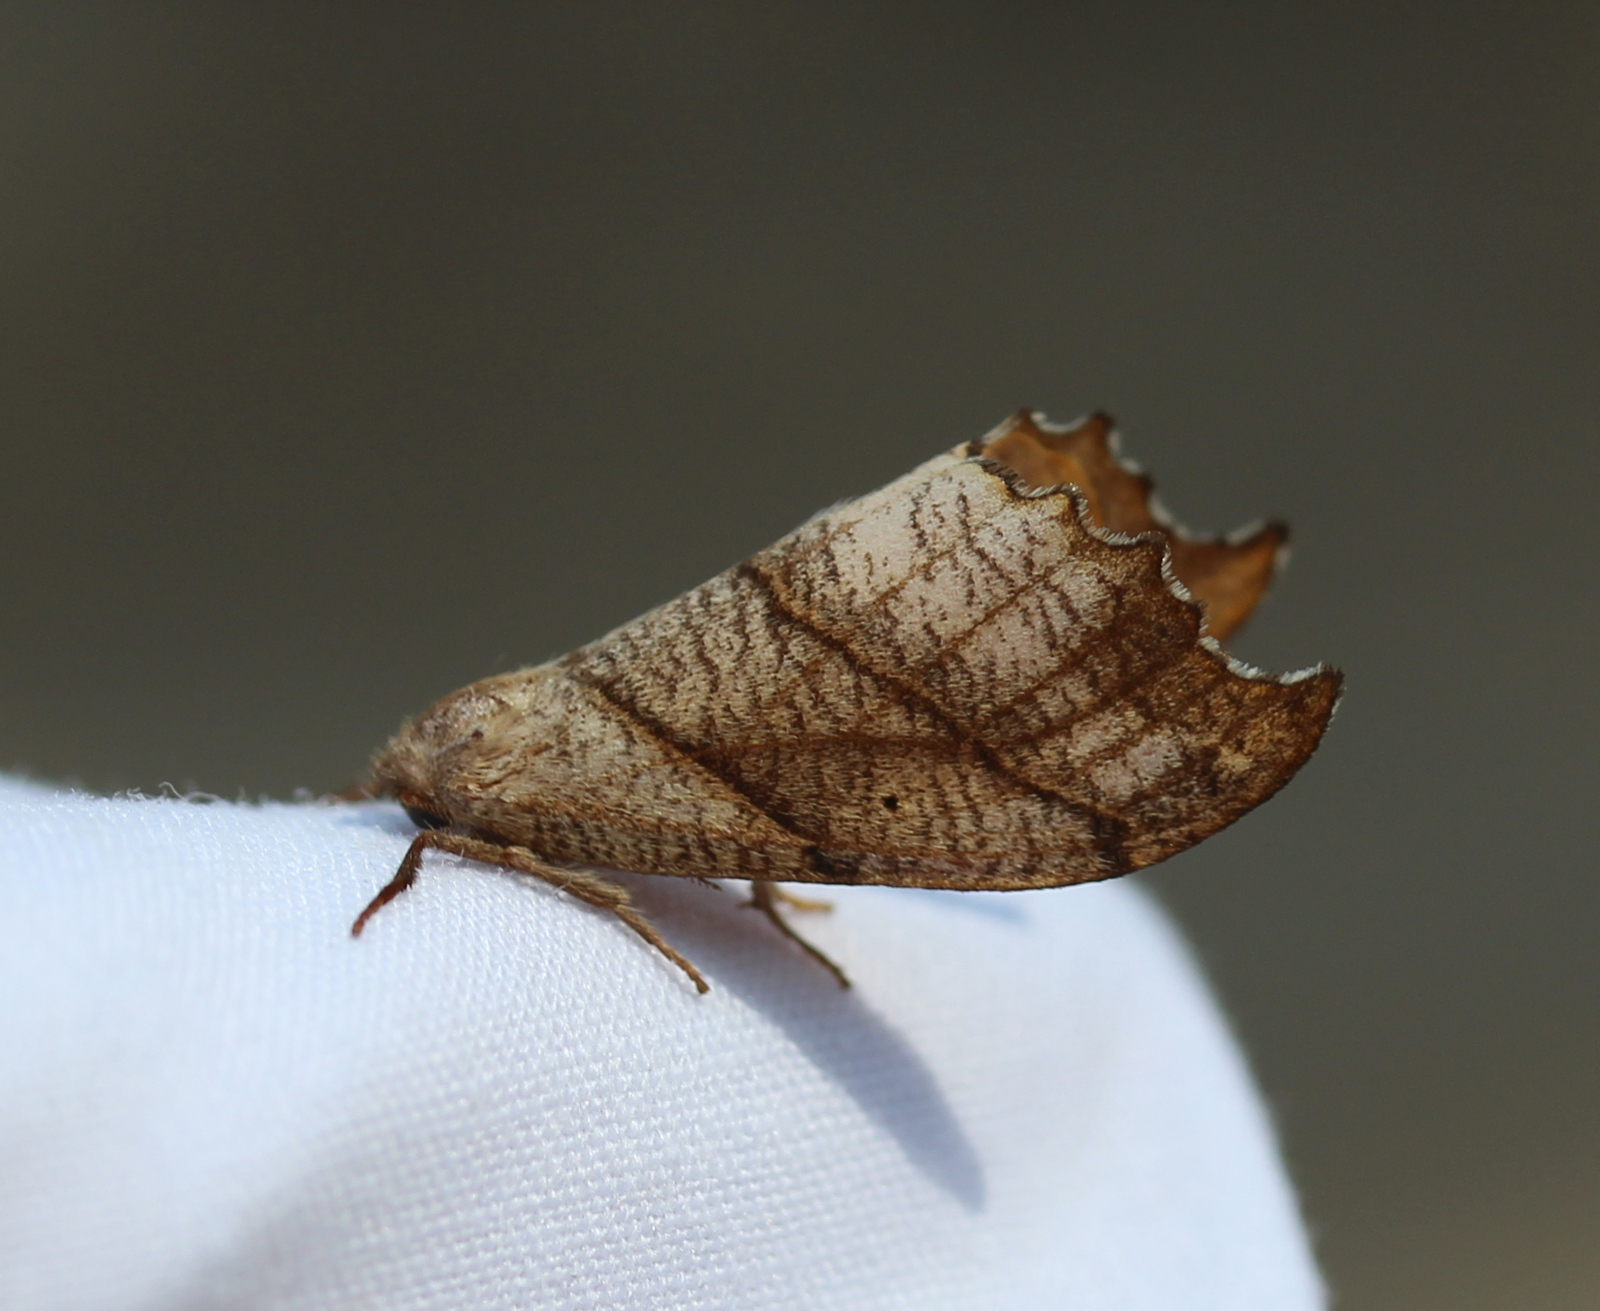 Brown moth, raised profile on white sheet.